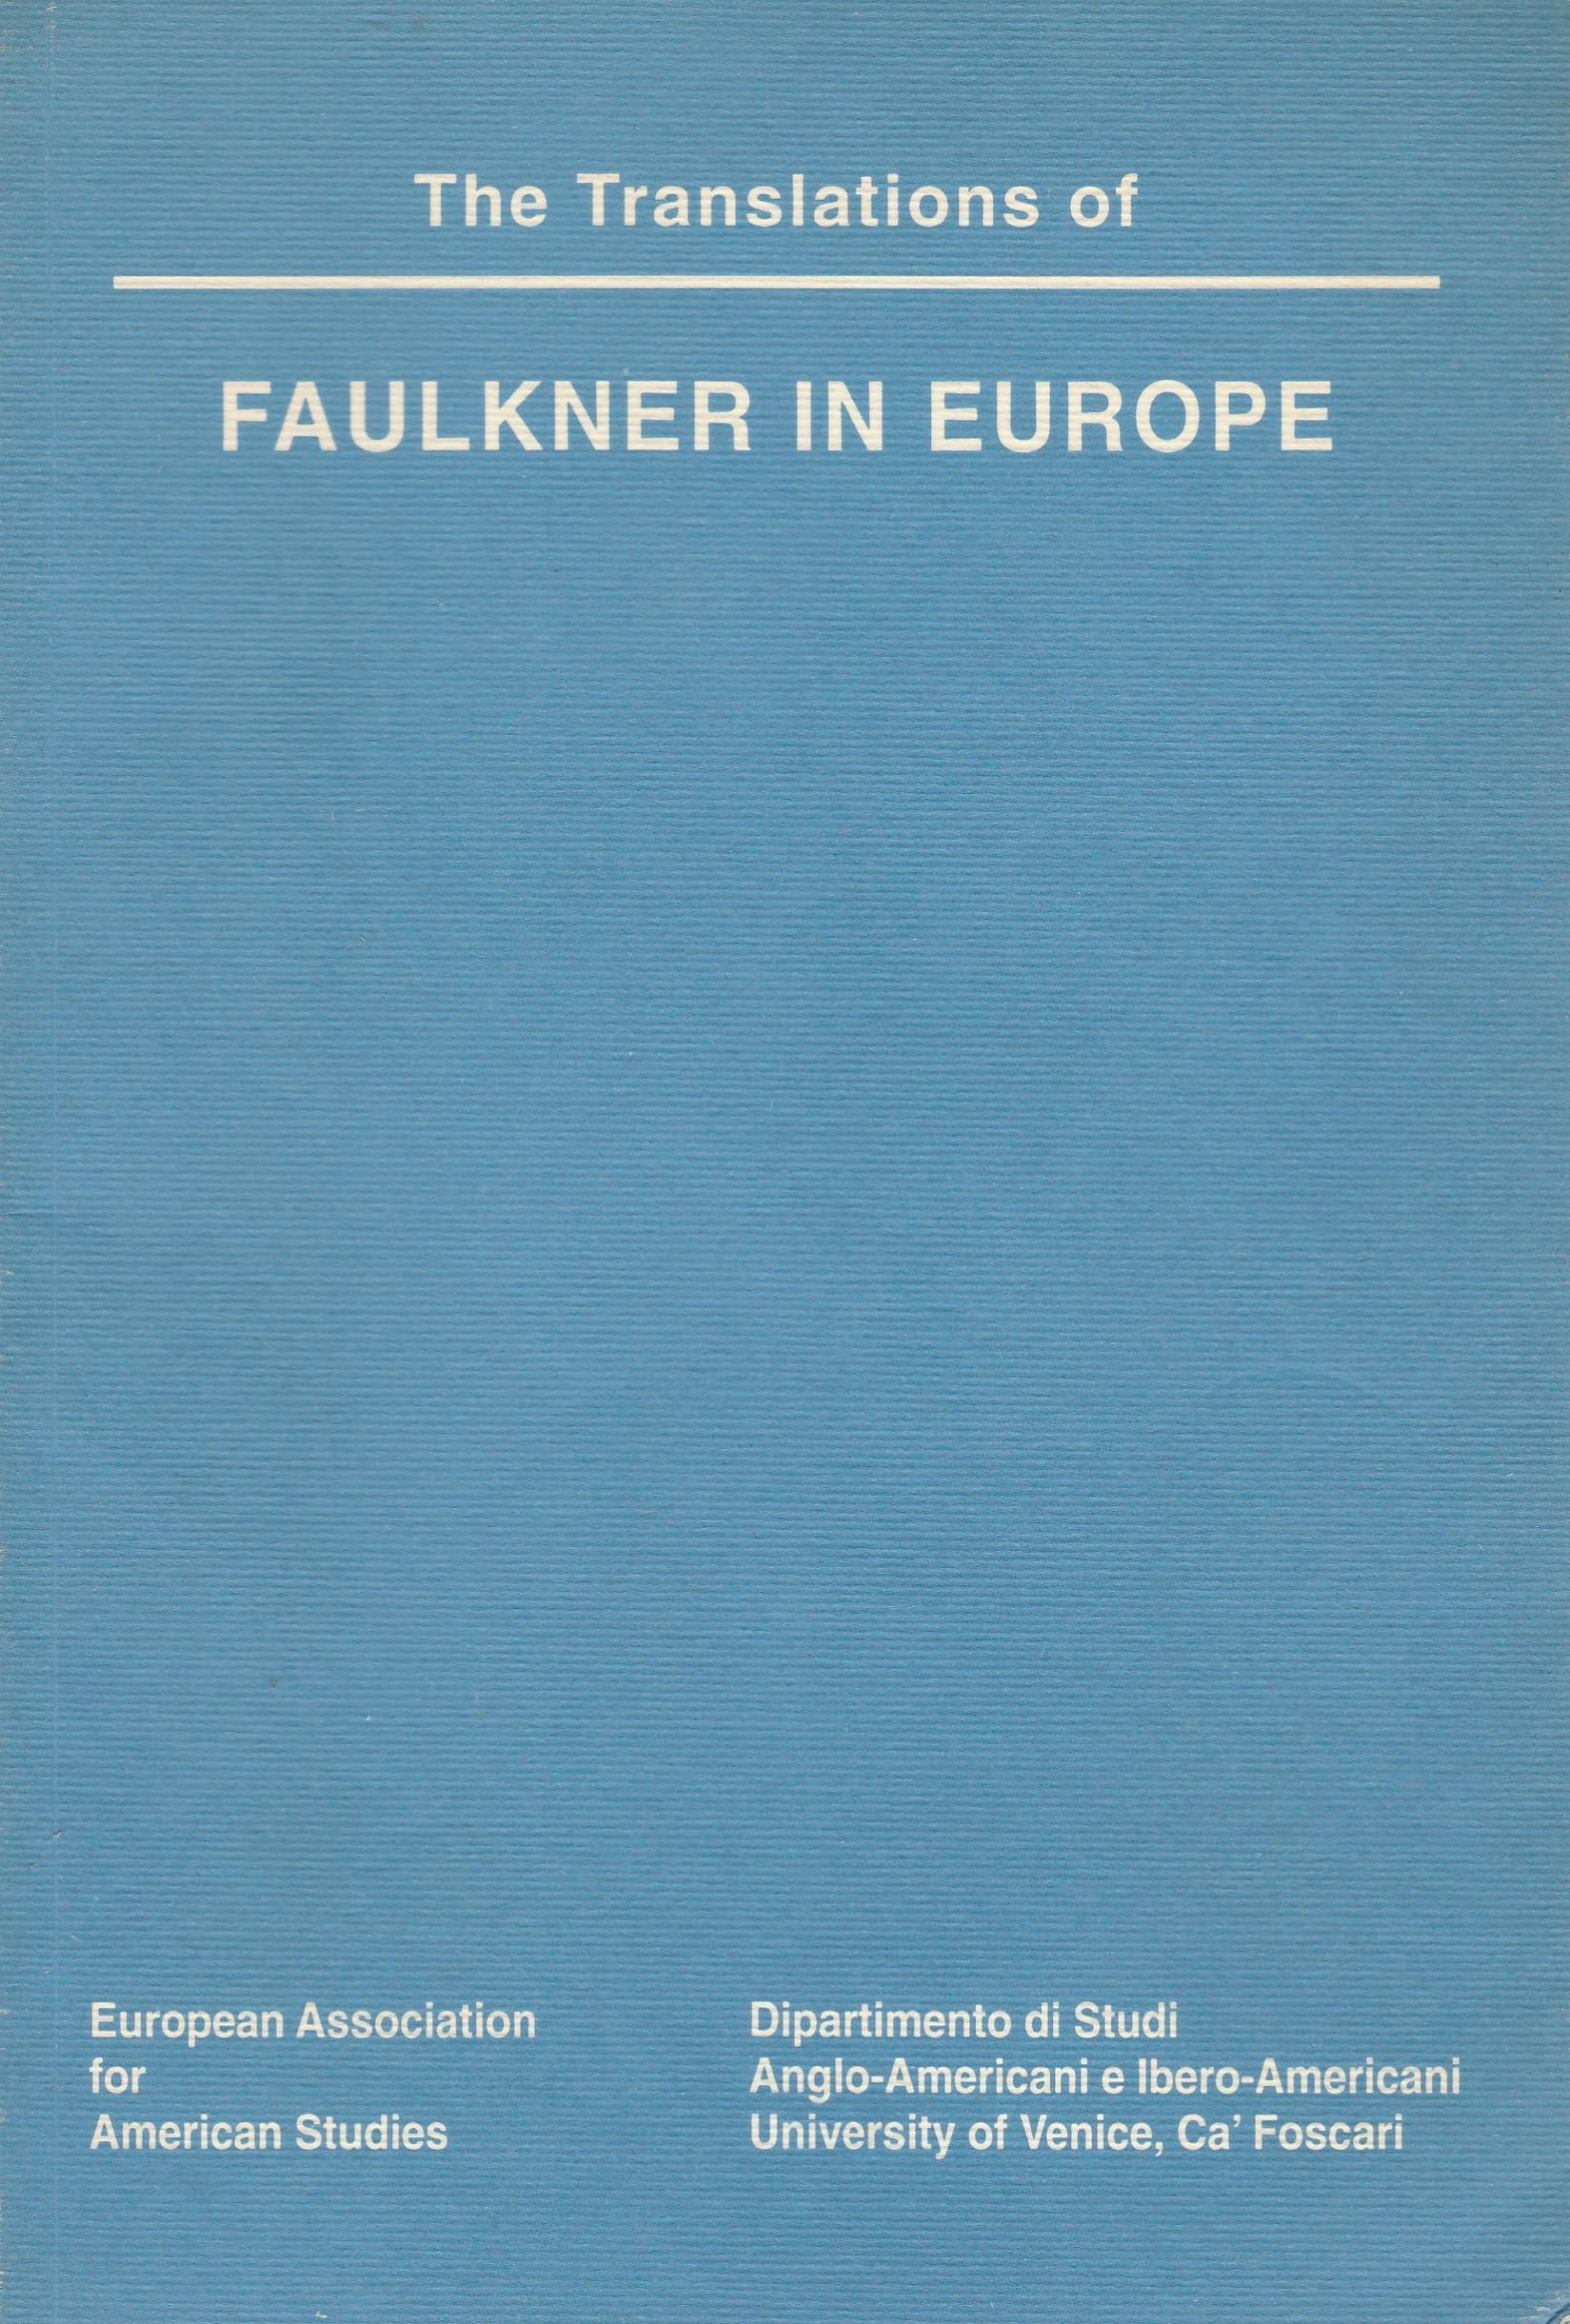 The Translations of Faulkner in Europe